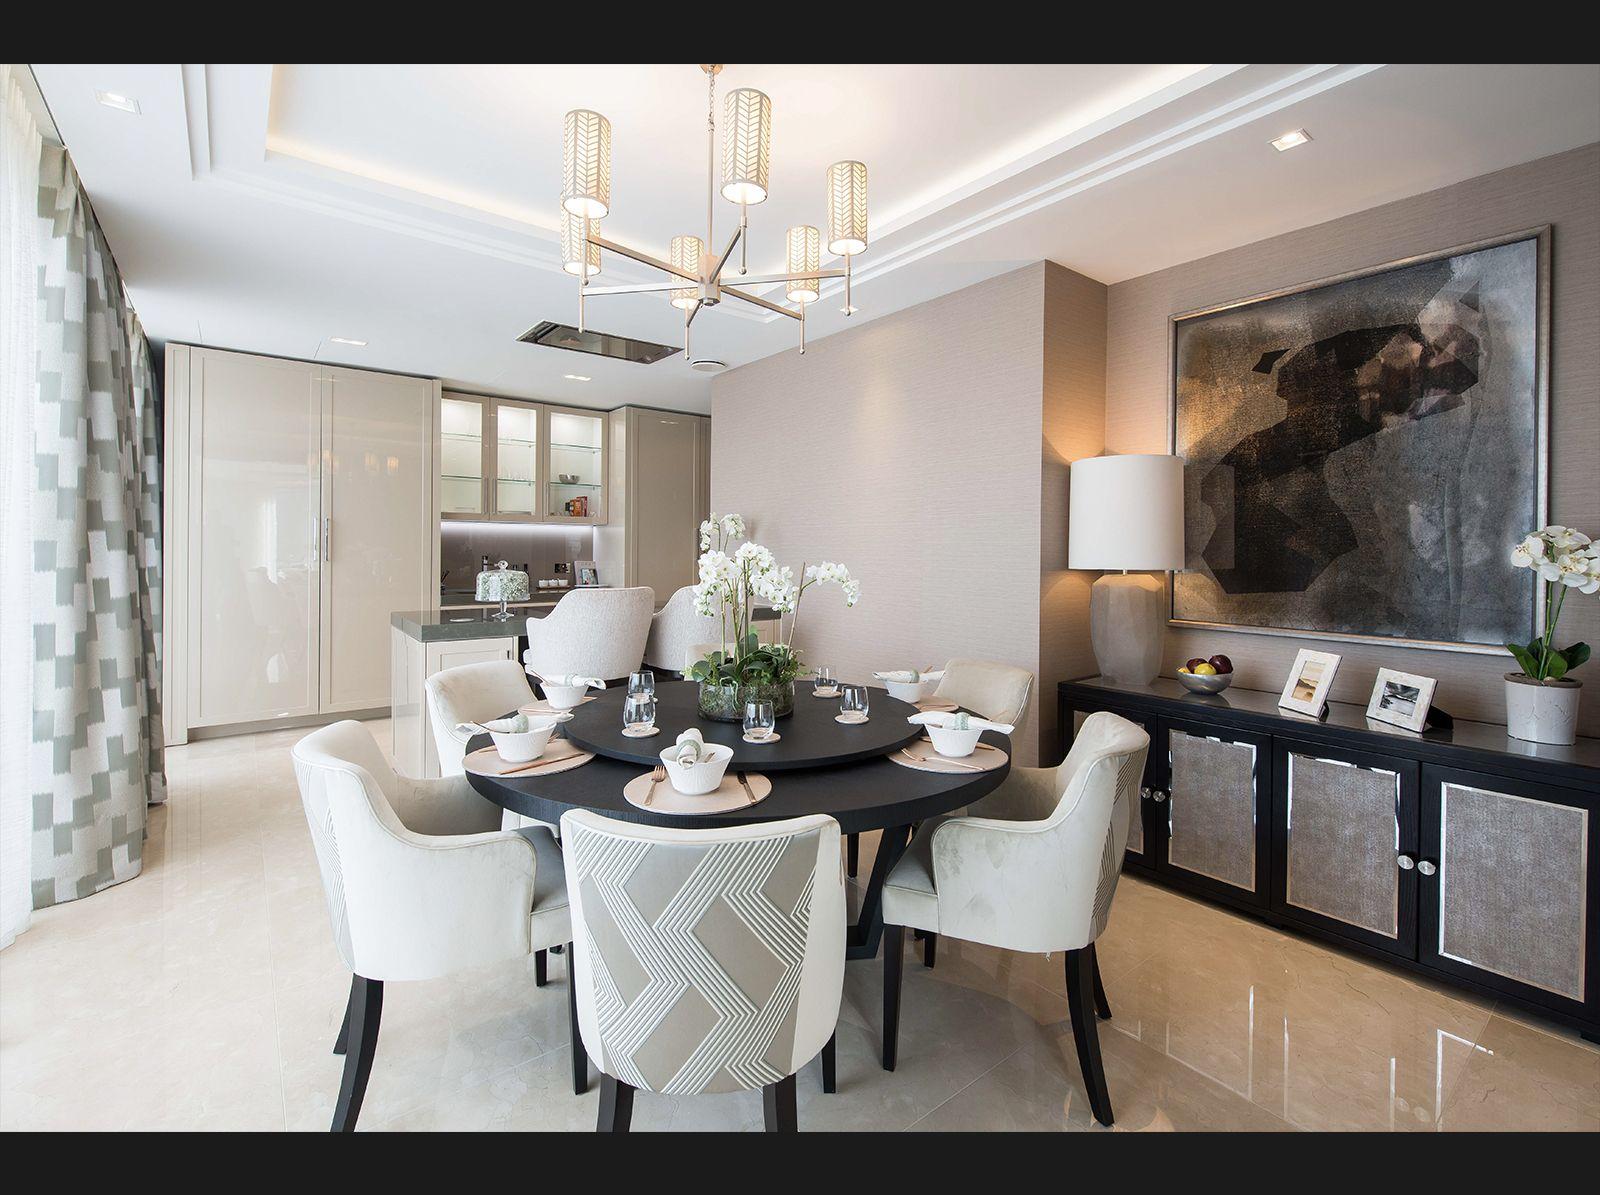 190 Strand U2013 Penthouse U2013 Cid Interior. PenthousesKitchen DesignsStrands